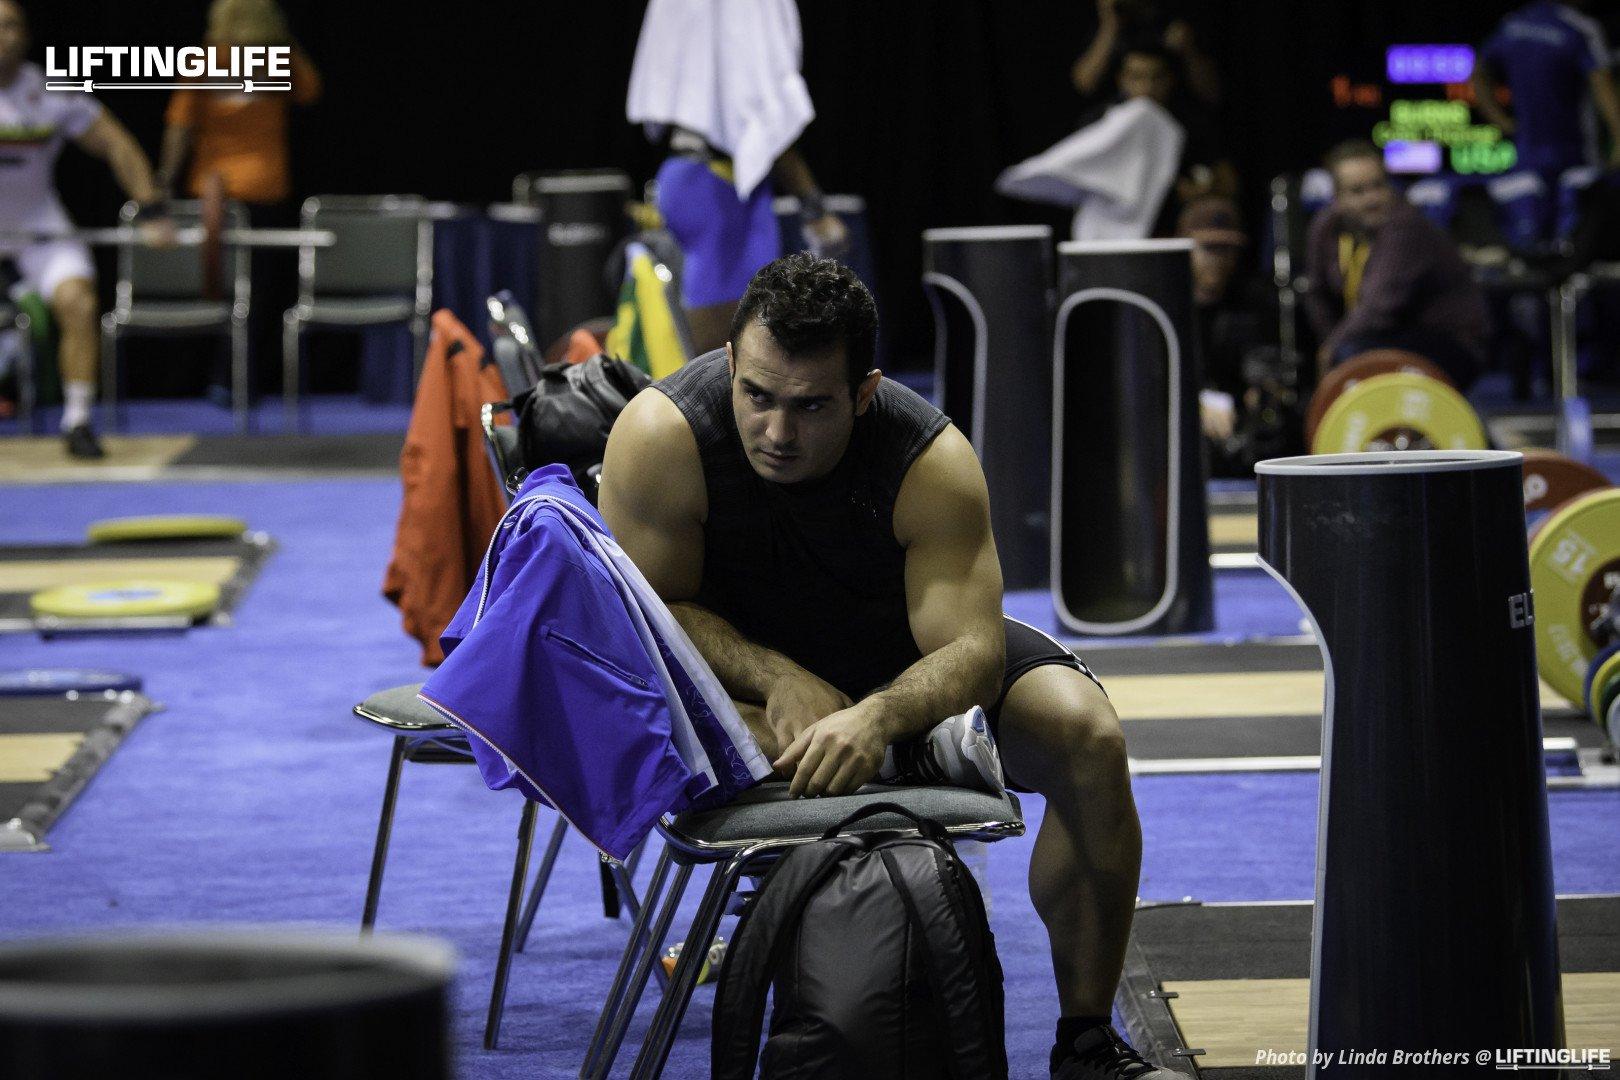 Iran weightlifter and world record holder Sohrab Moradi comeback lifts tracker